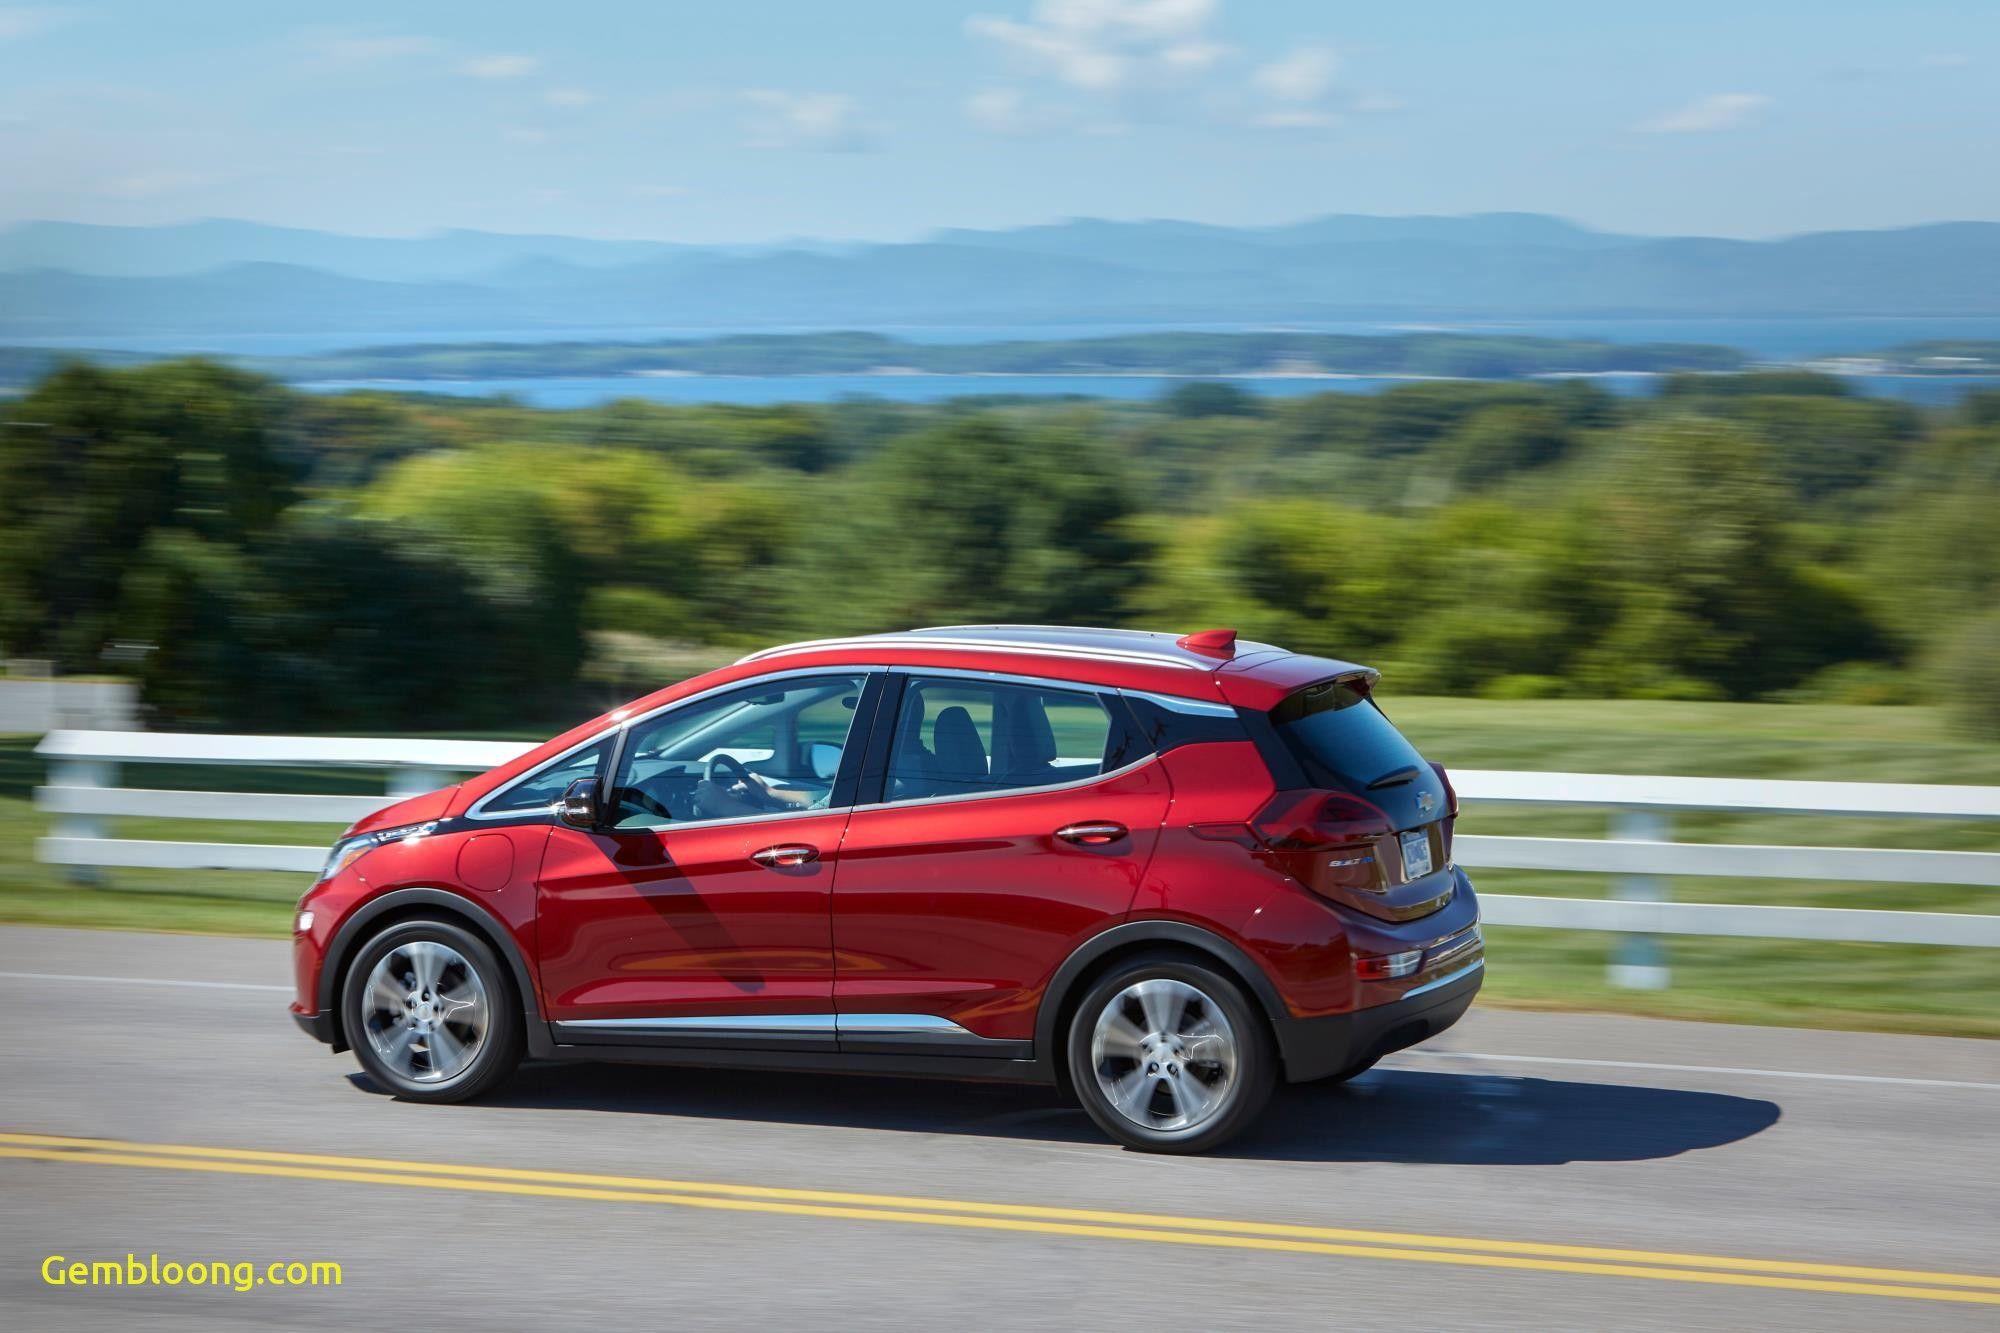 2020 Chevrolet Bolt Ev Range Increases Over Entry Model 3 In 2020 Chevy Bolt Chevrolet Volt Chevrolet